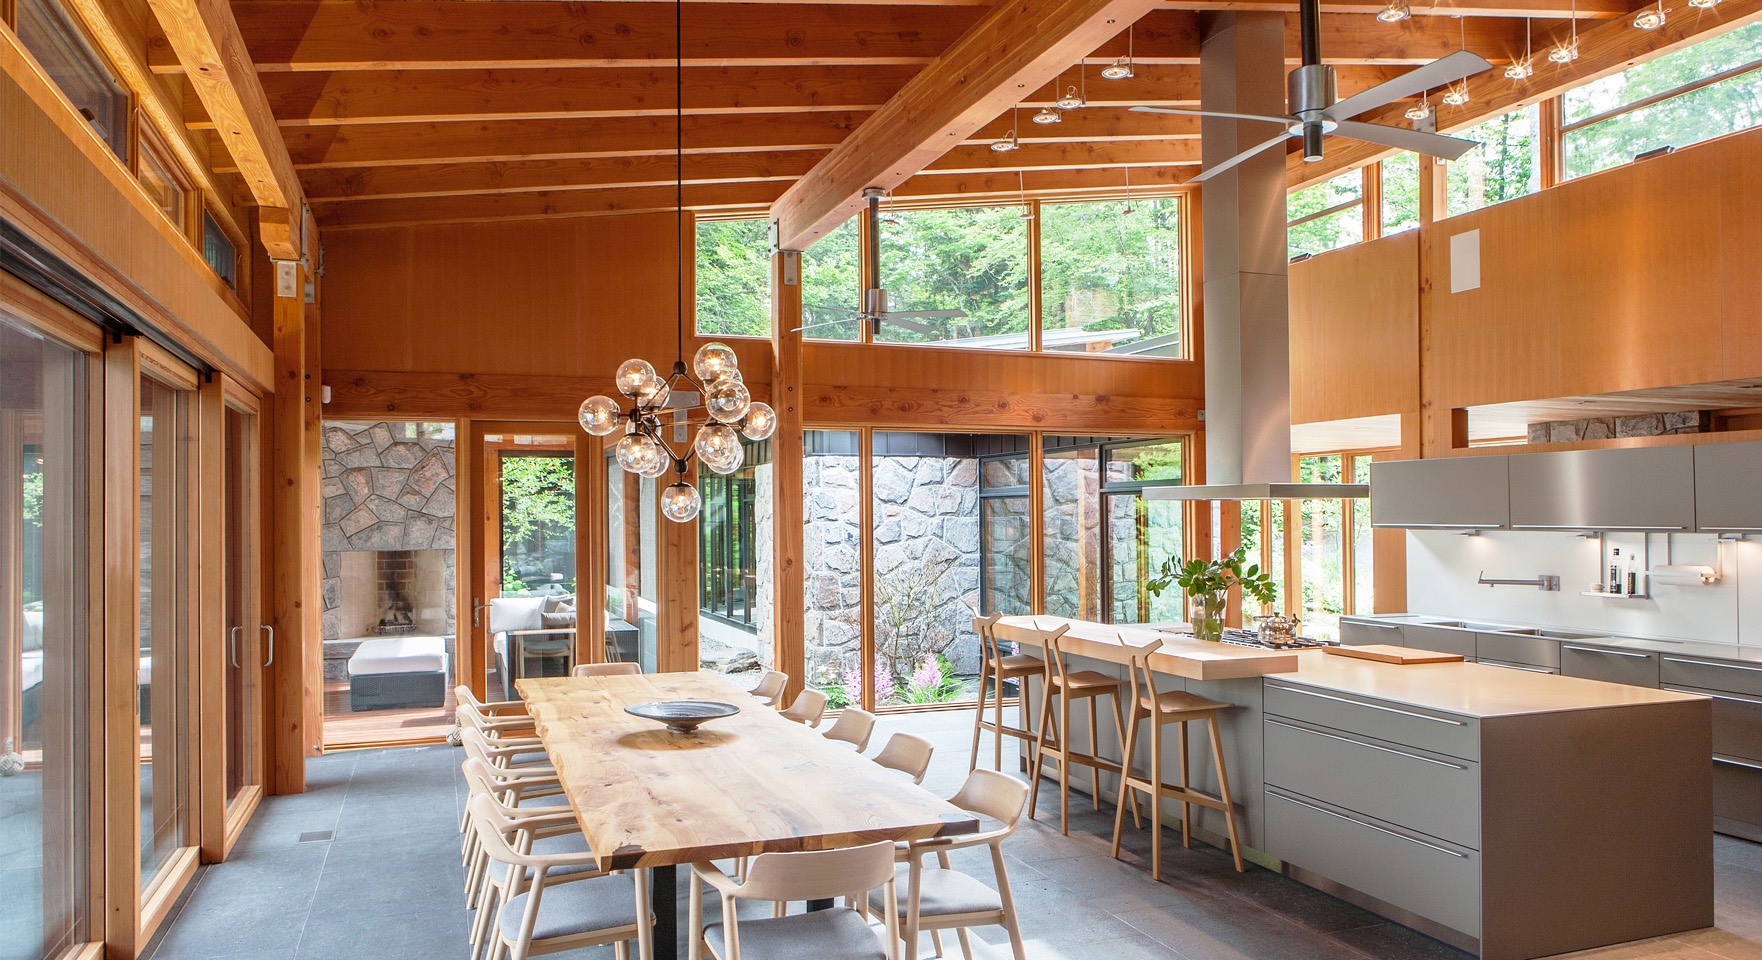 muskoka cottage 8 jpg christopher simmonds architect rh csarchitect com